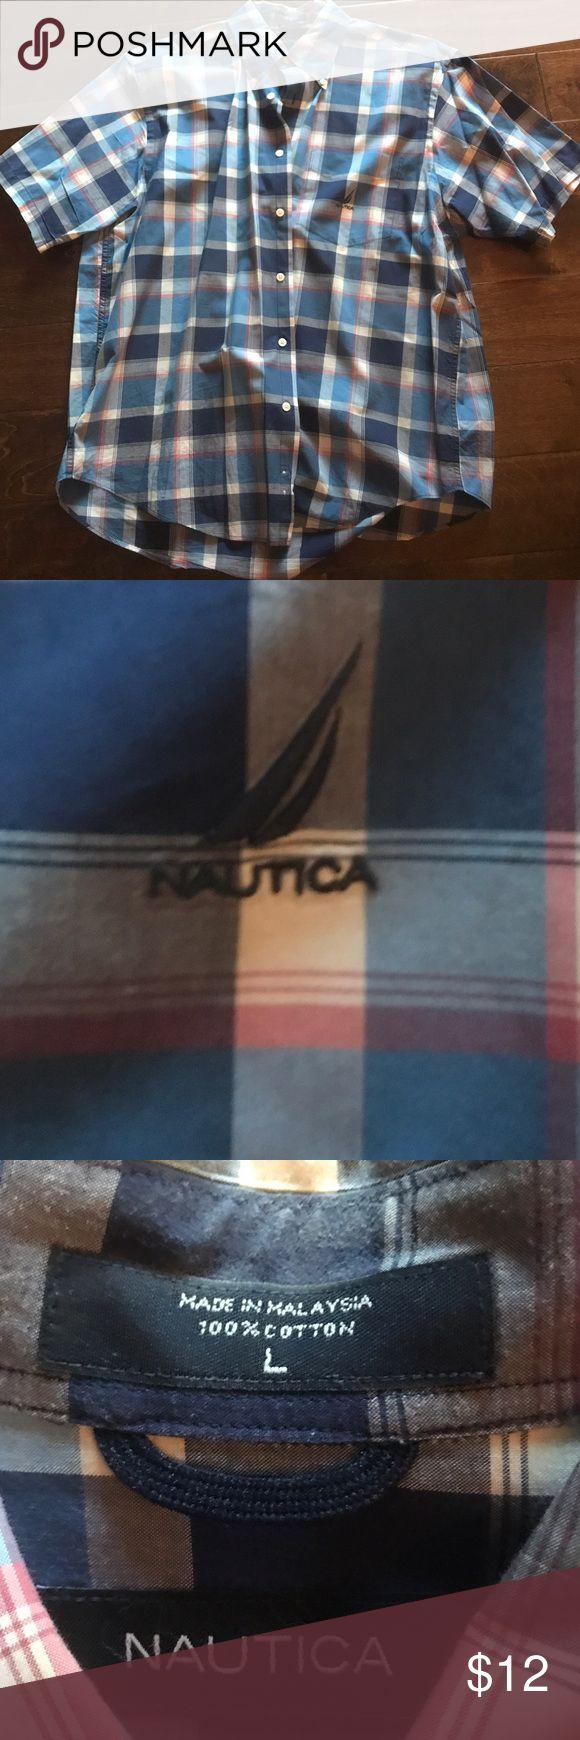 🎉 Nautica Blue Plain Casual Button Down Size Lg 🎉🆕 New without tags blue plaid casual button down shirt. Size large. Nautica Shirts Casual Button Down Shirts